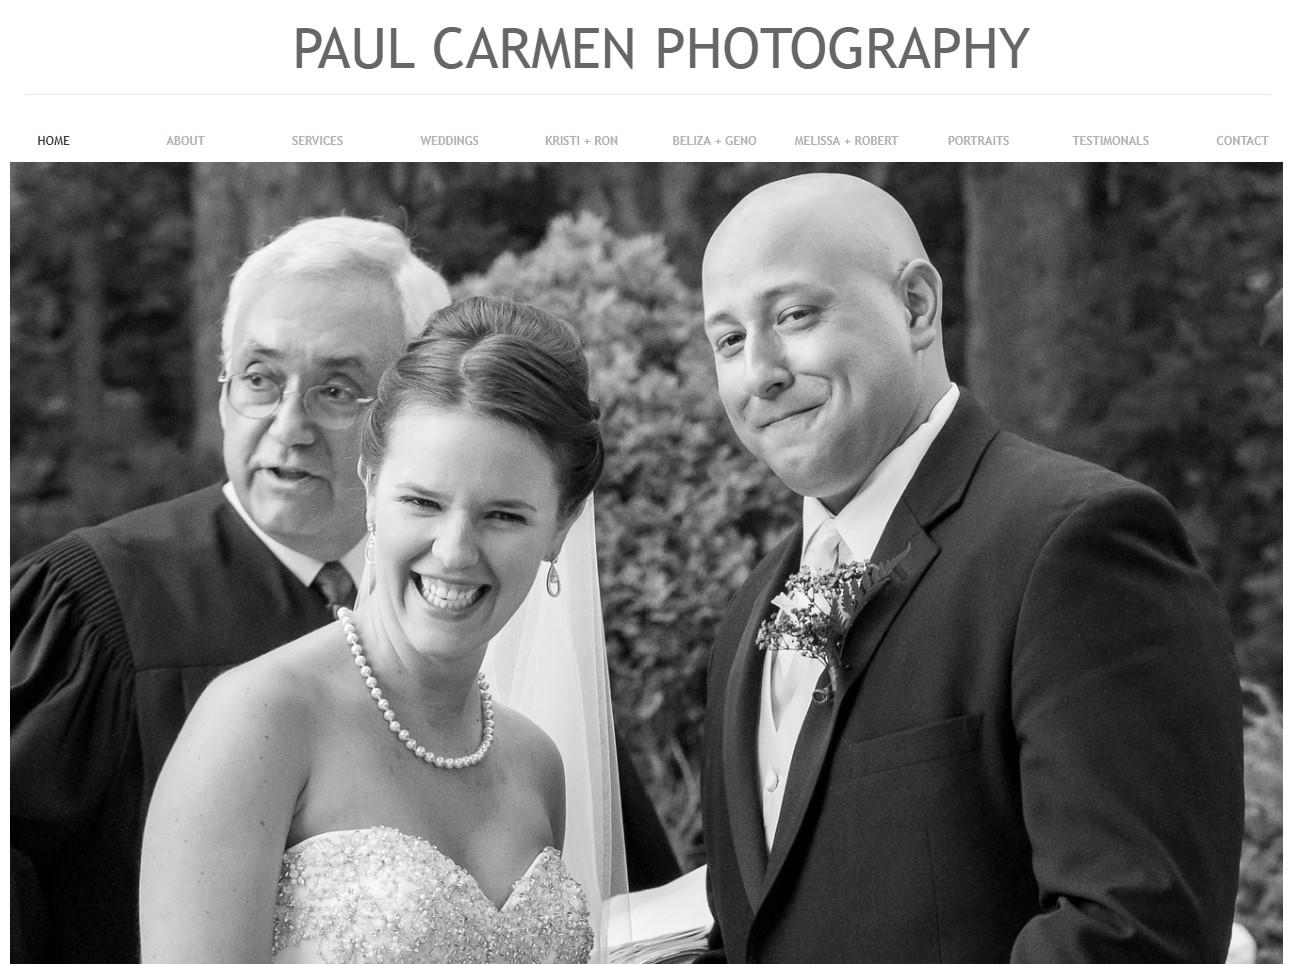 Paul Carmen Photography